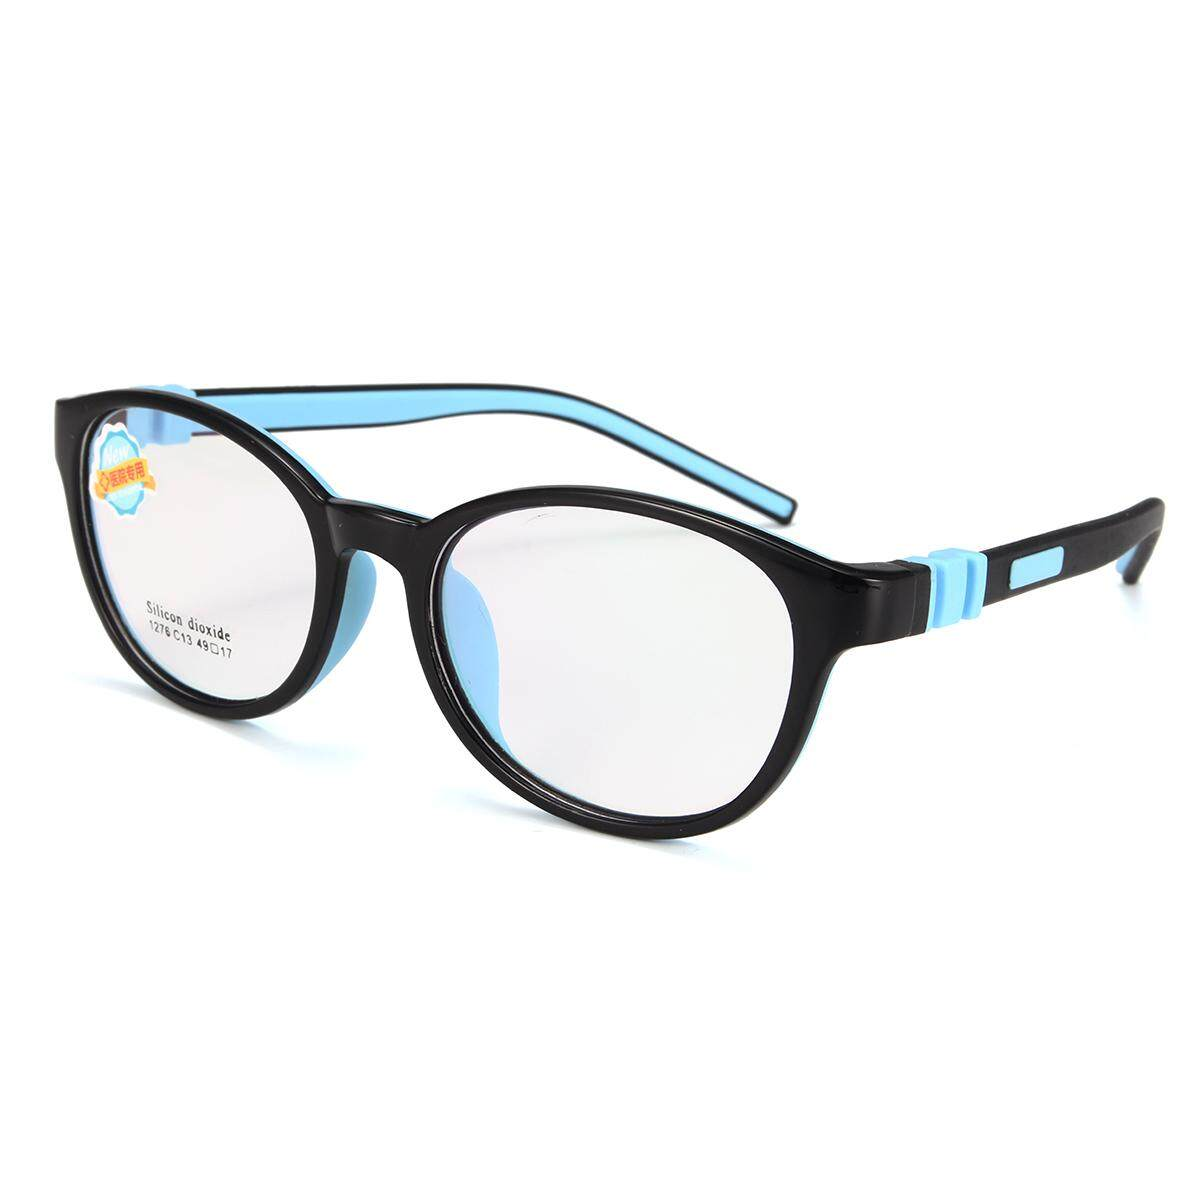 Kids Designer Glasses for sale - Designer Glasses for Kids online ...